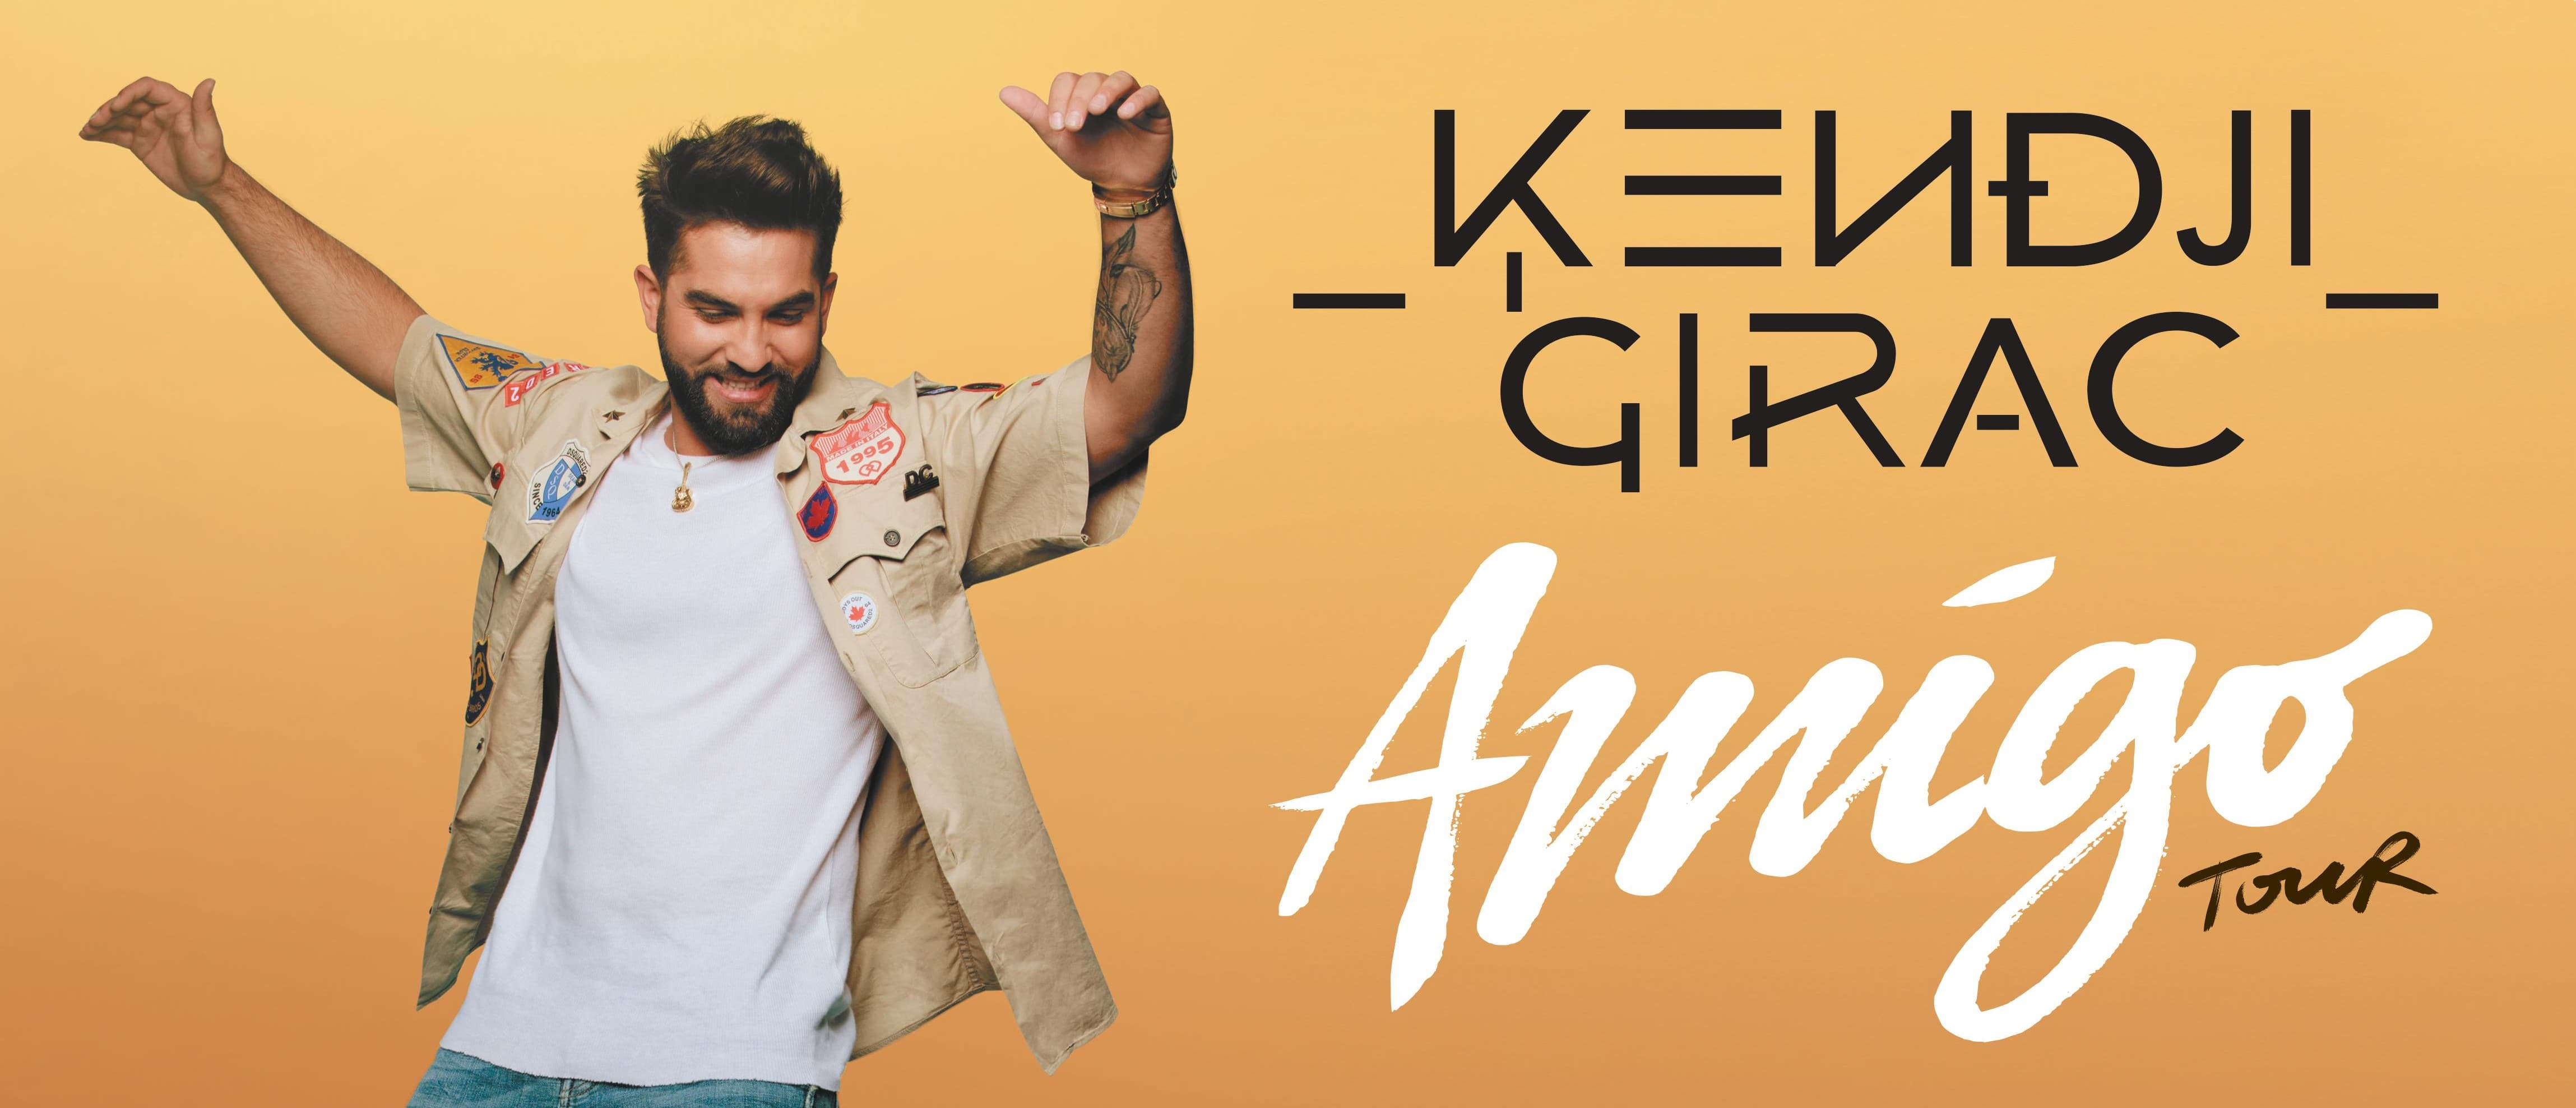 kendji_girac_amigo_tour